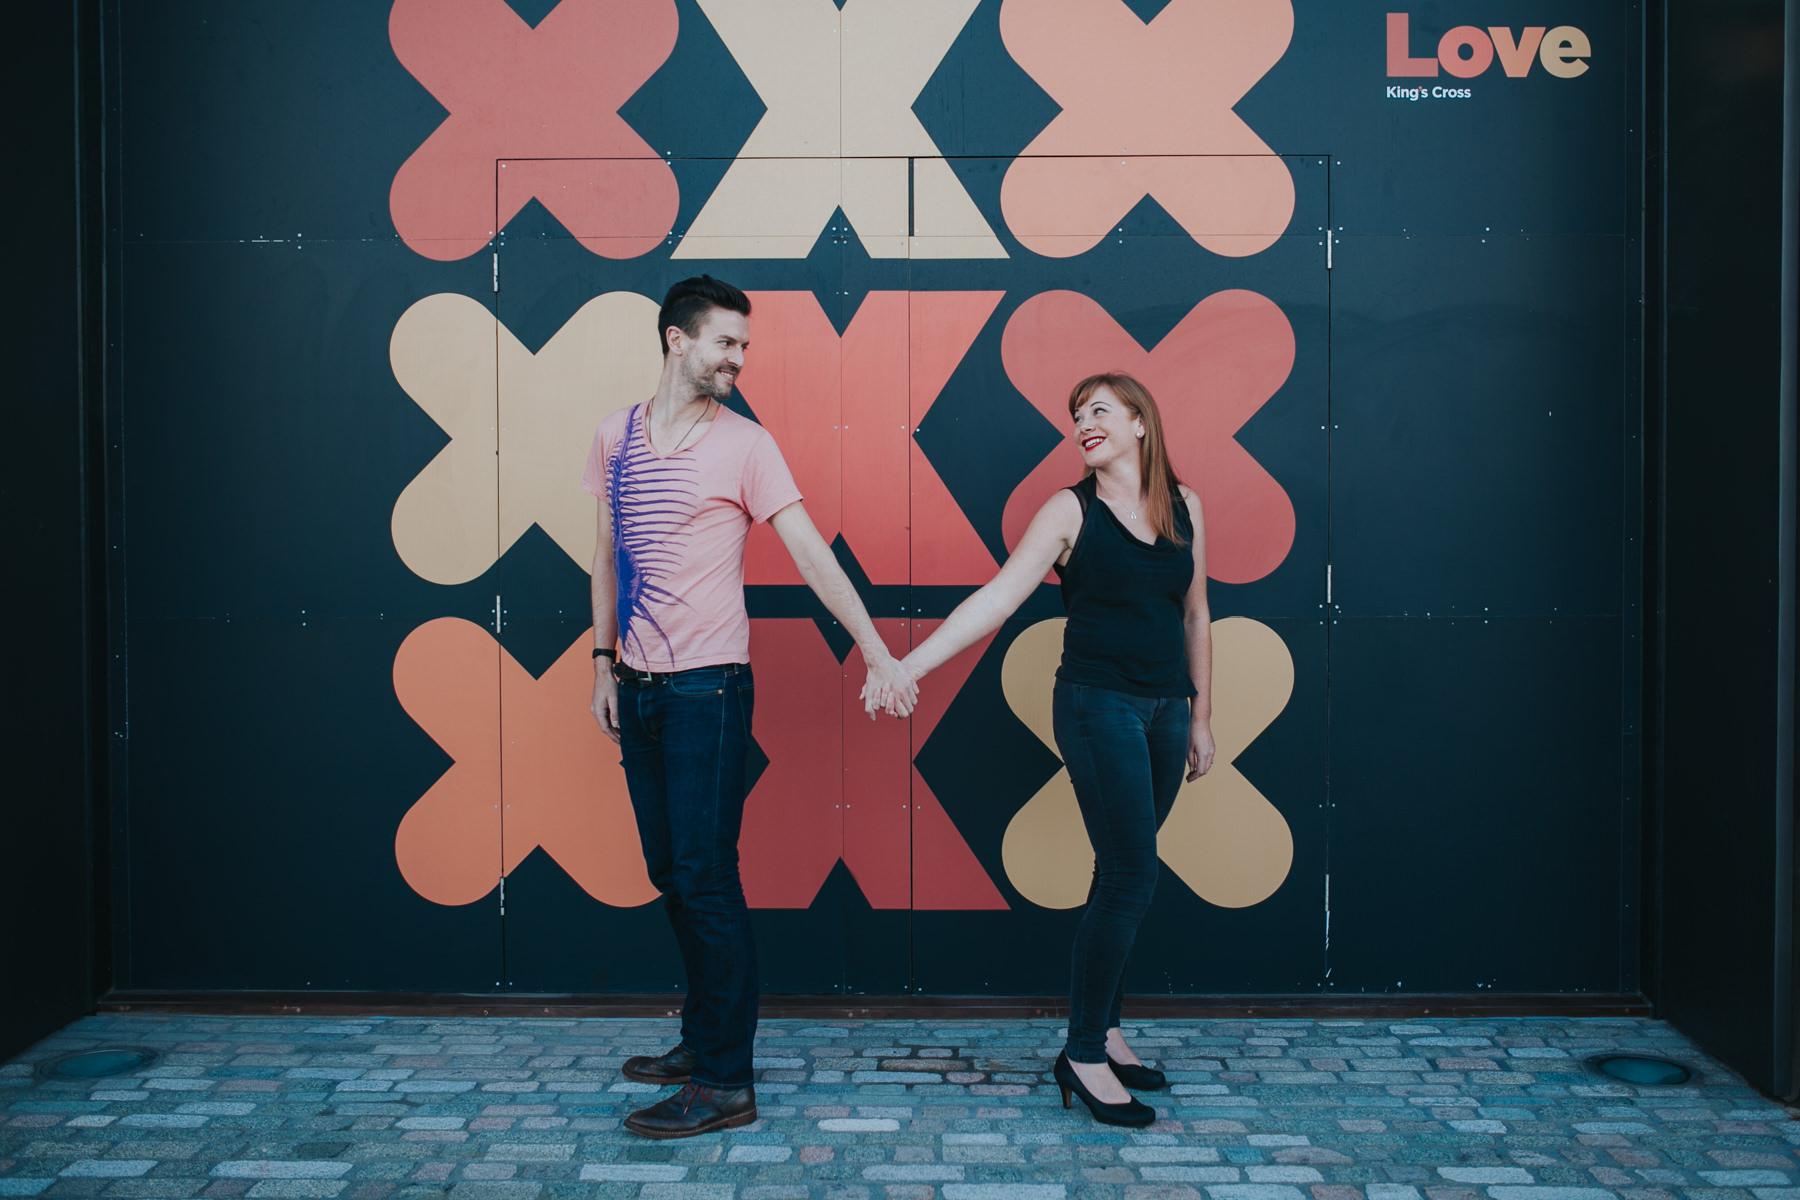 graphic-crosses-background-London-engagement-session-Kings-Cross-couple-portraits